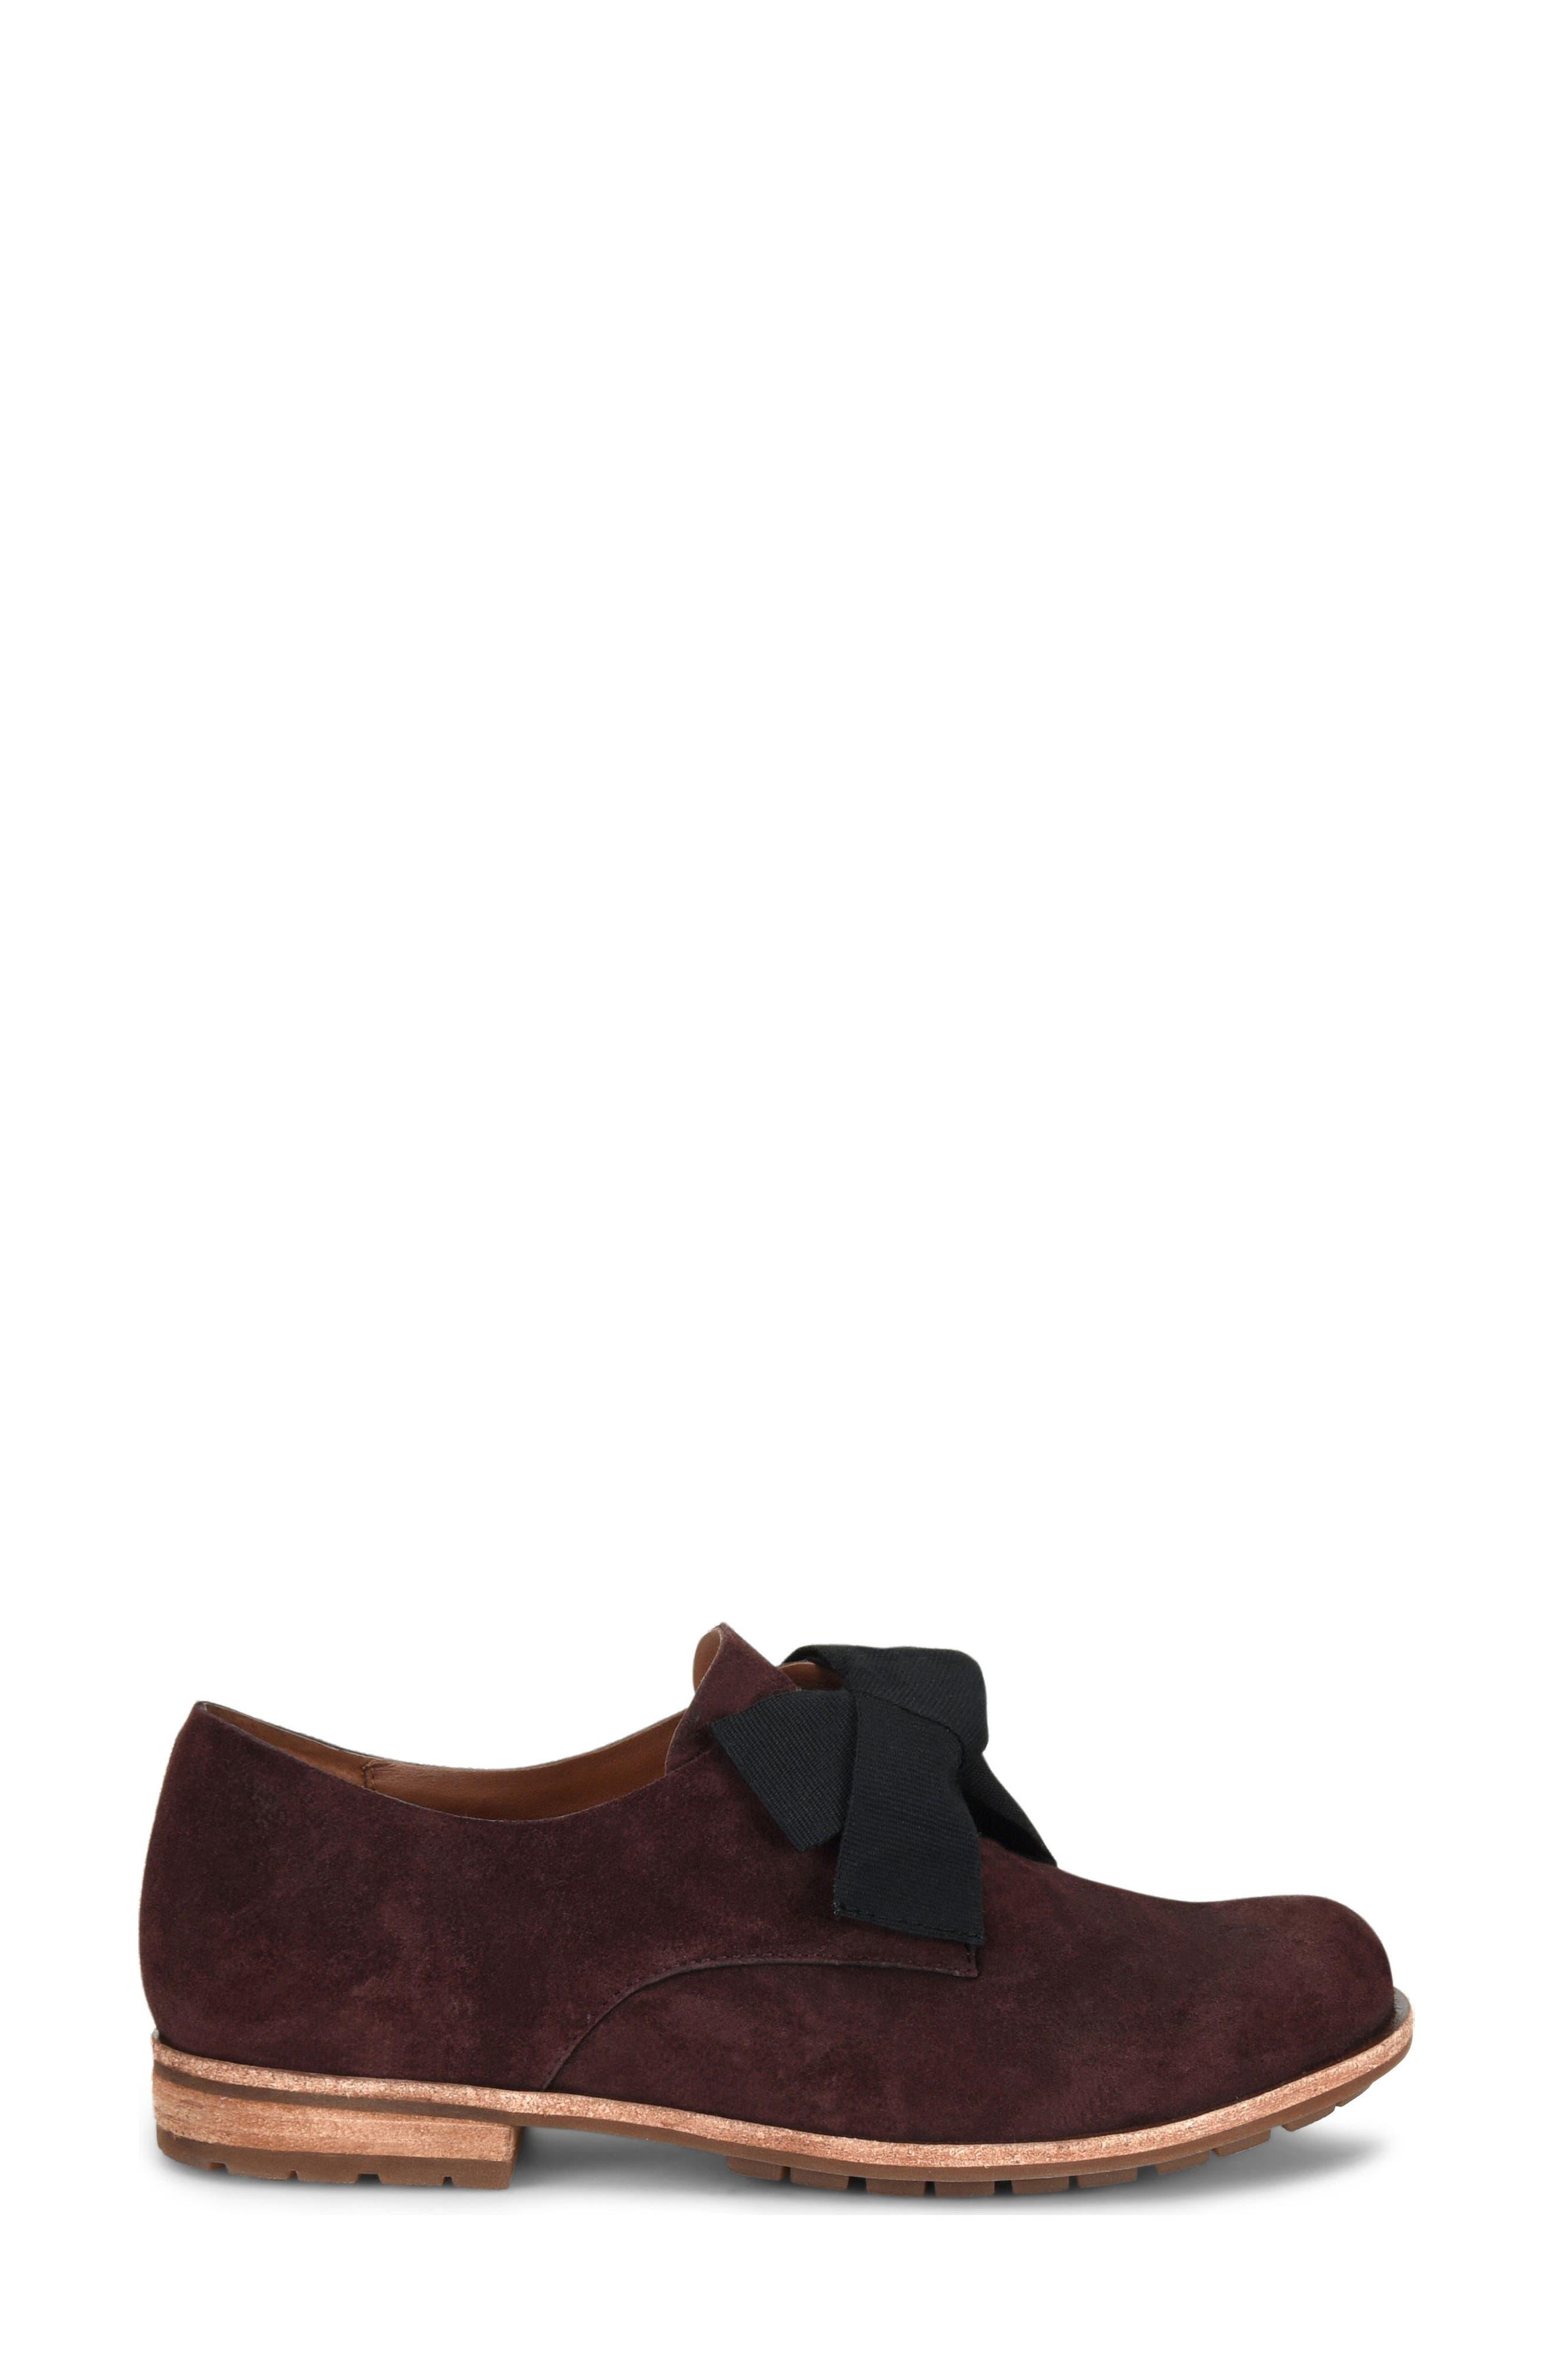 Beryl Bow Flat,                             Alternate thumbnail 3, color,                             Burgundy Suede